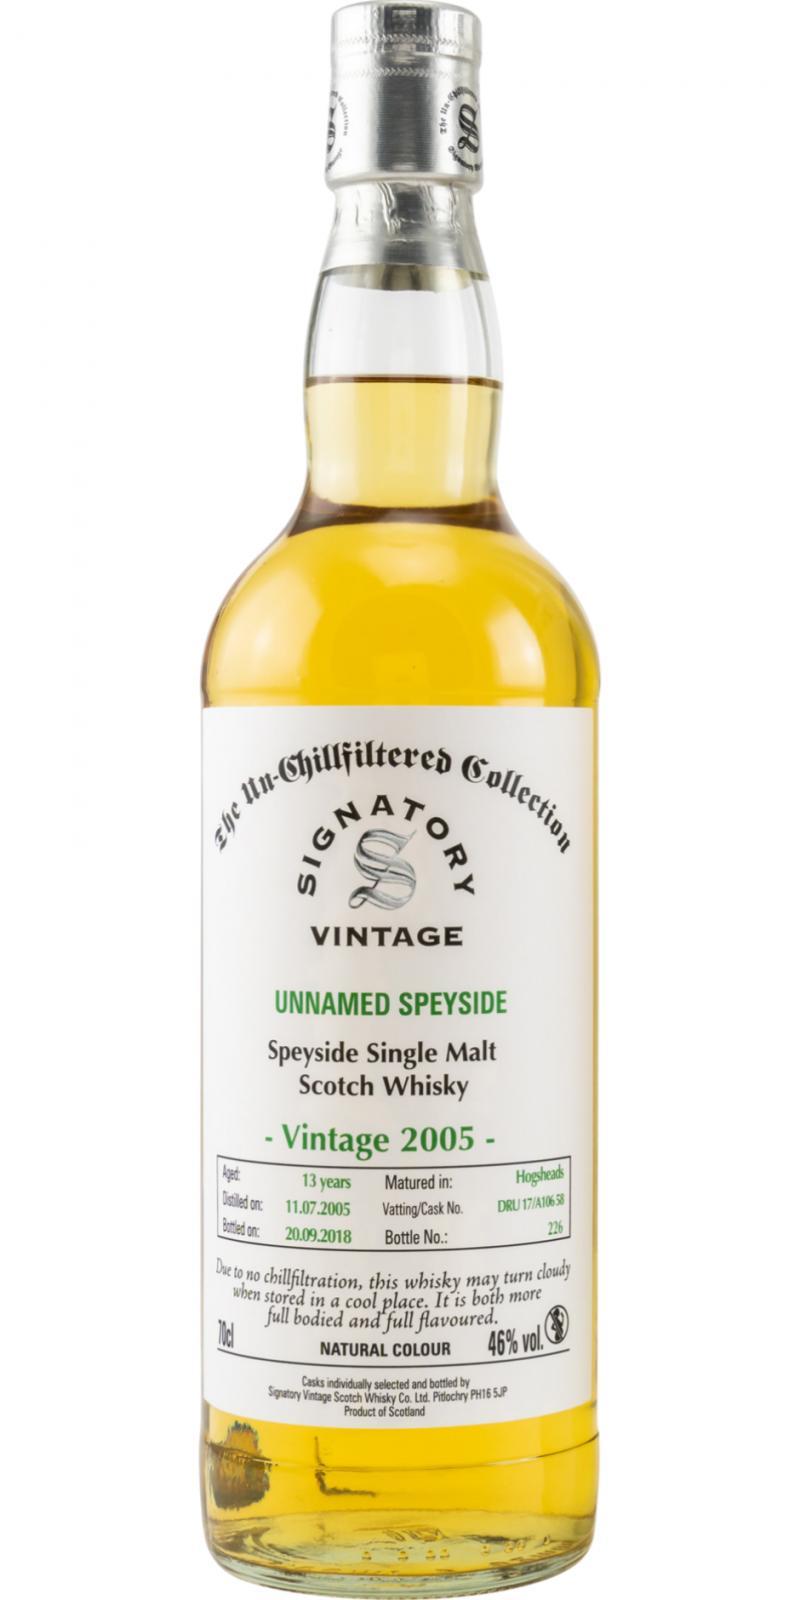 Unnamed Speyside 2005 SV